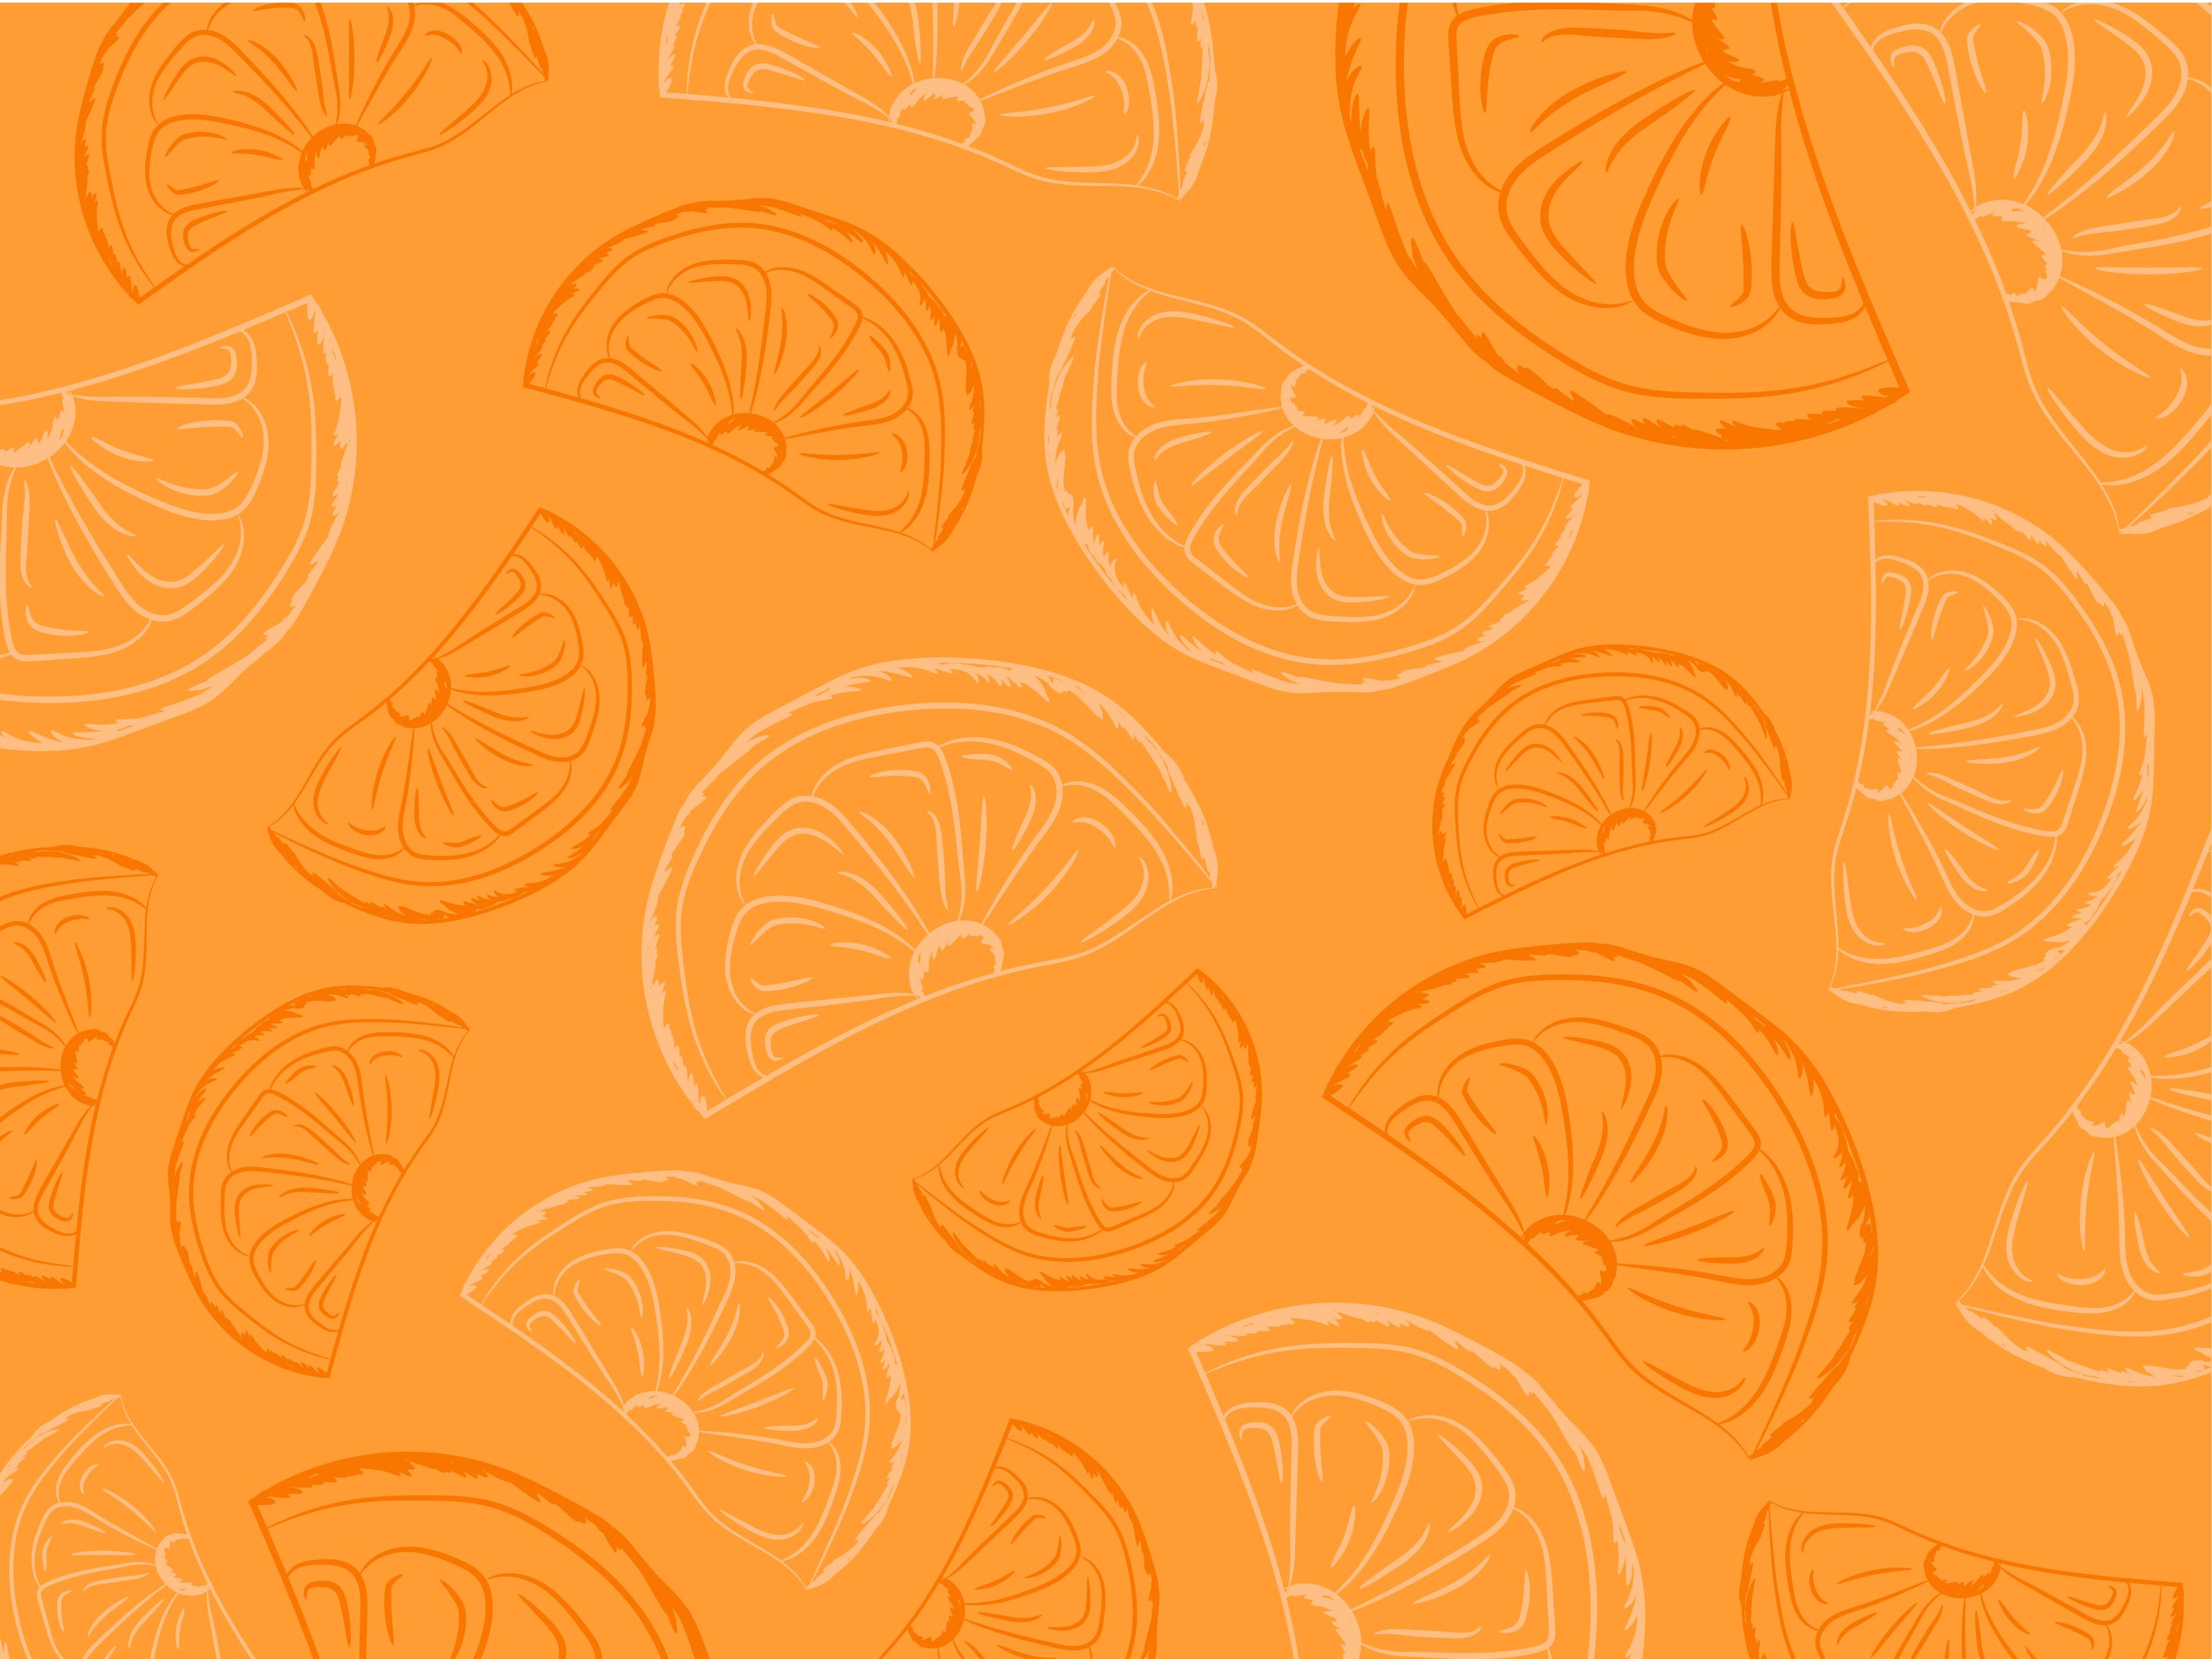 Orange Vector Background Free Download